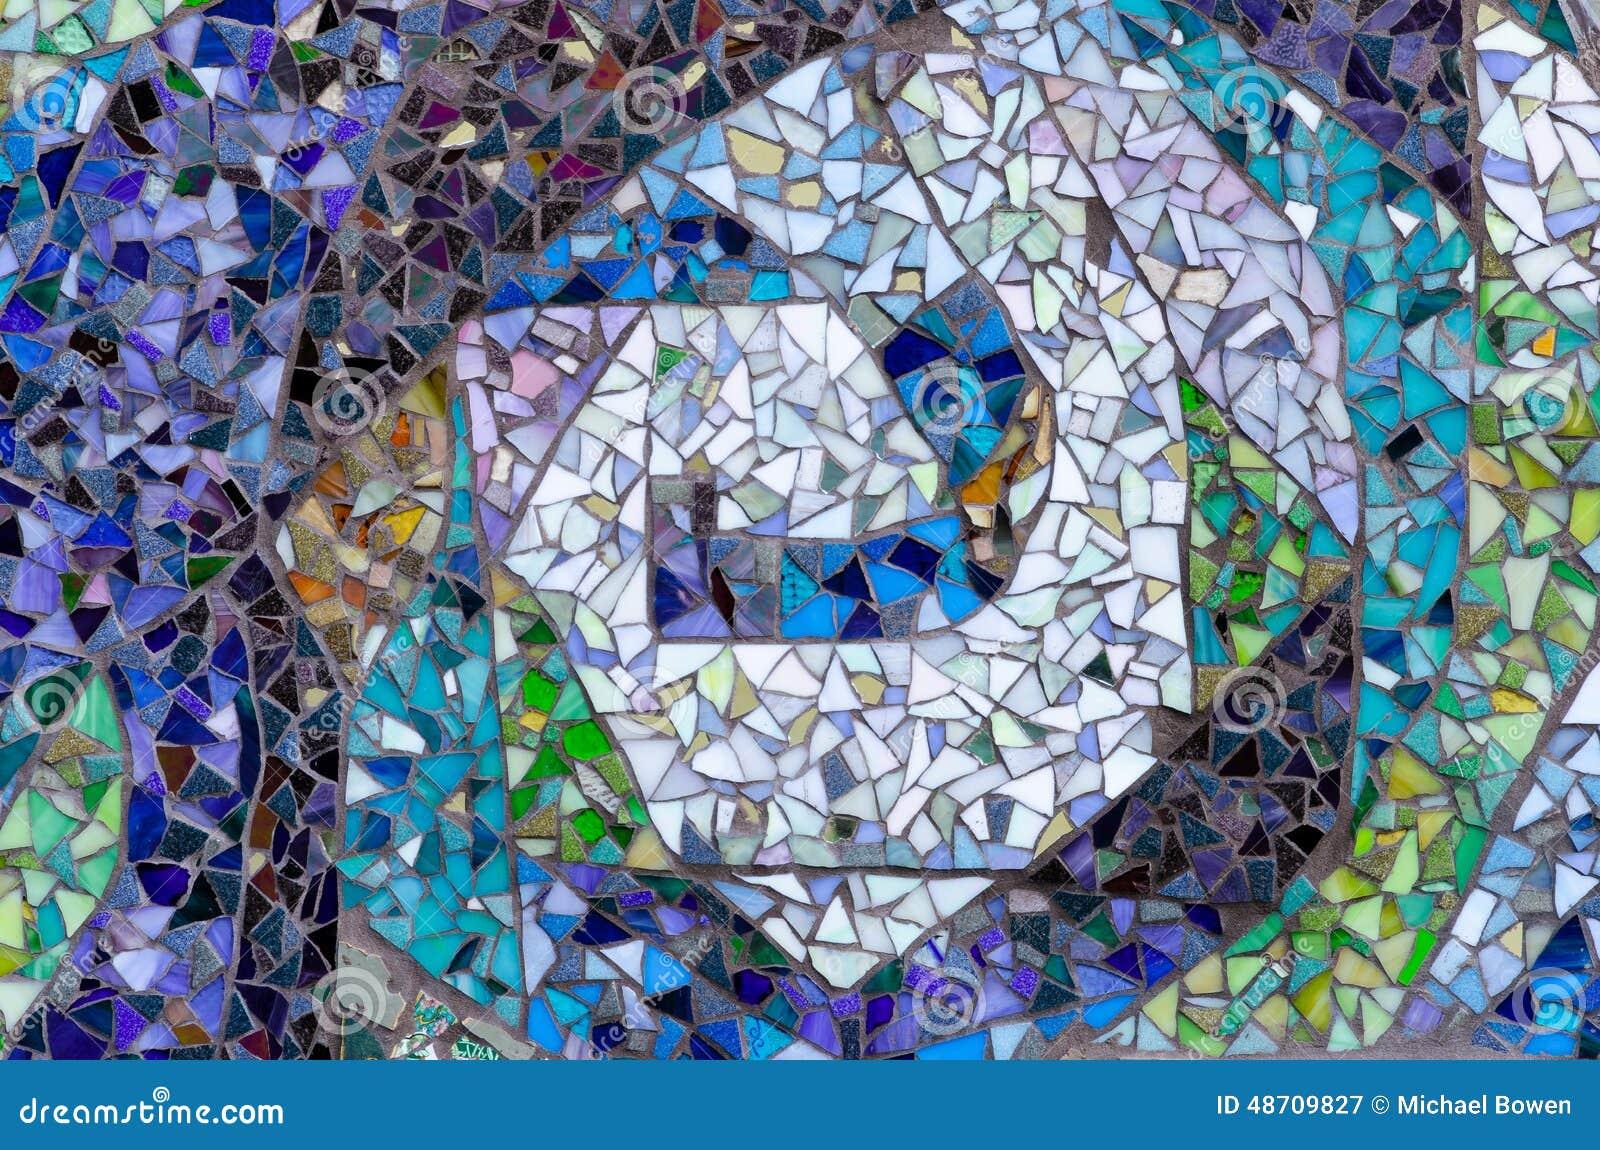 Exterior Mosaic Design Of Assorted Broken Tile Stock